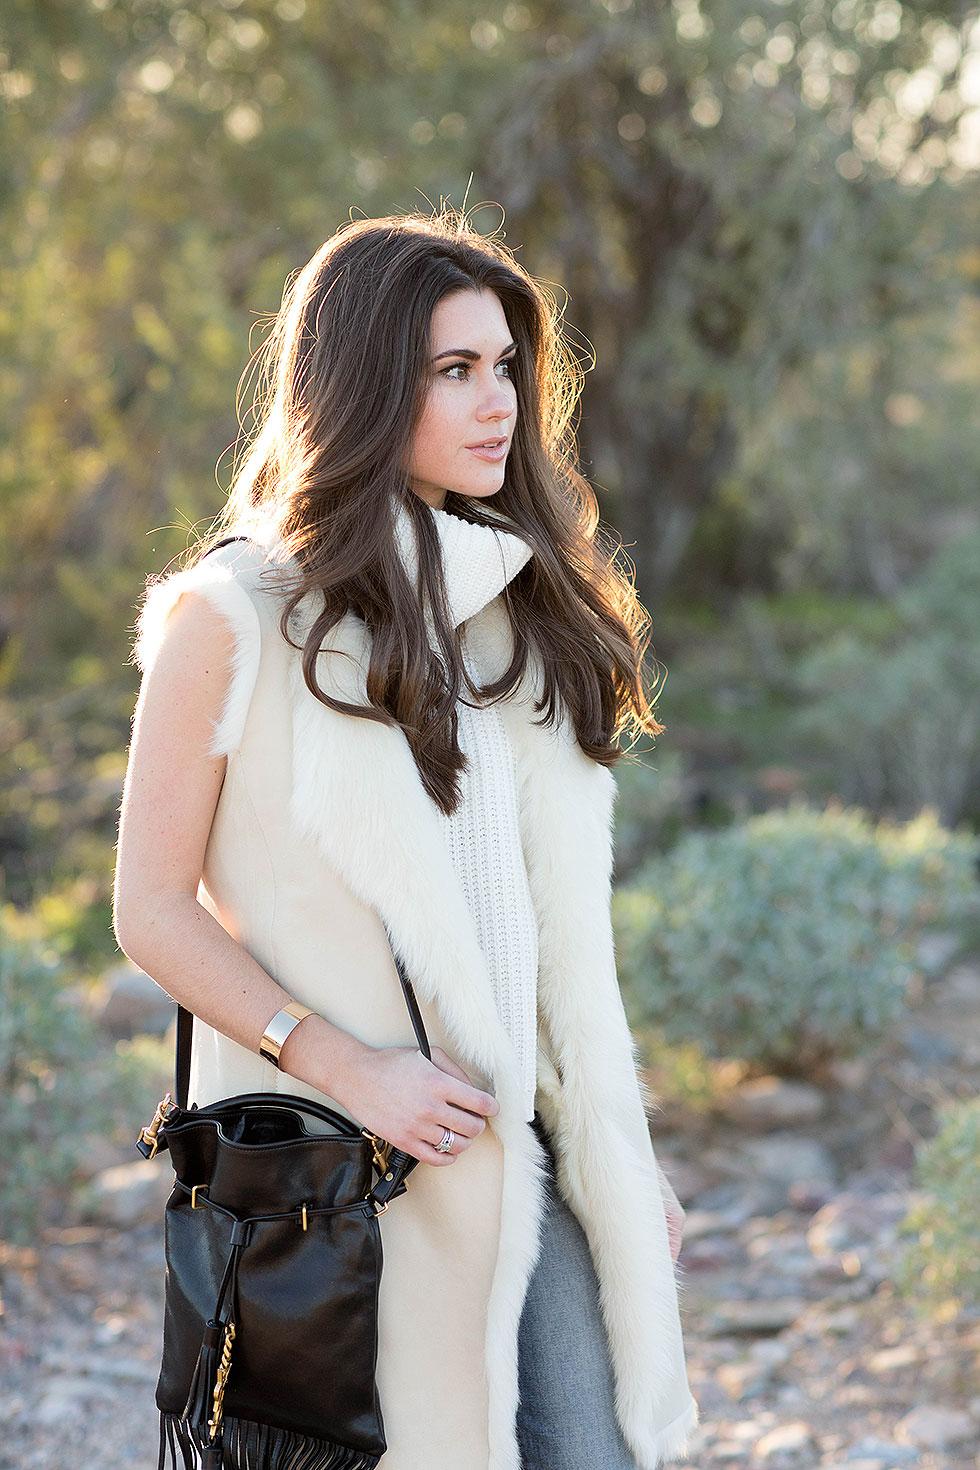 Theory Ivory Shearling Vest, Saint Laurent Monogram Desert Outfit Arizona